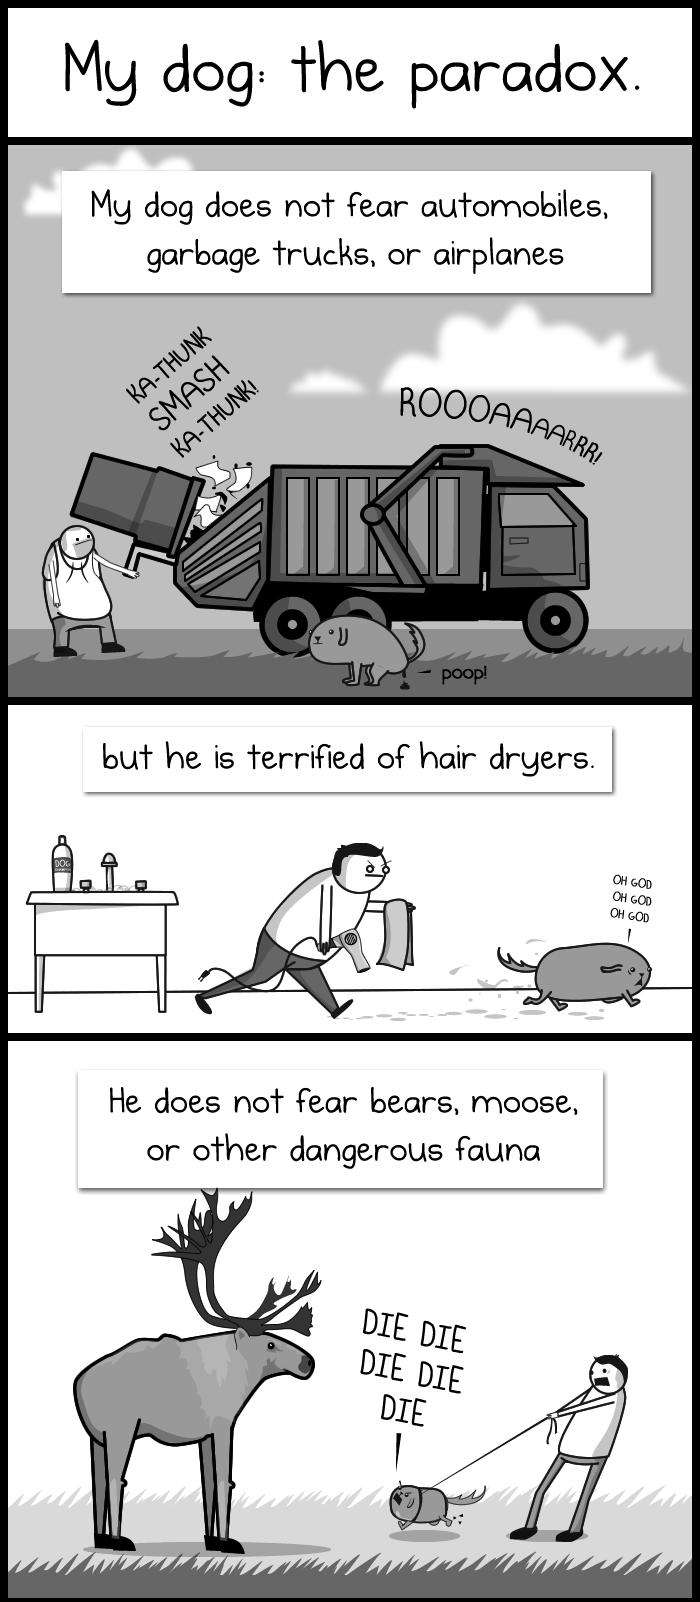 My dog: the paradox